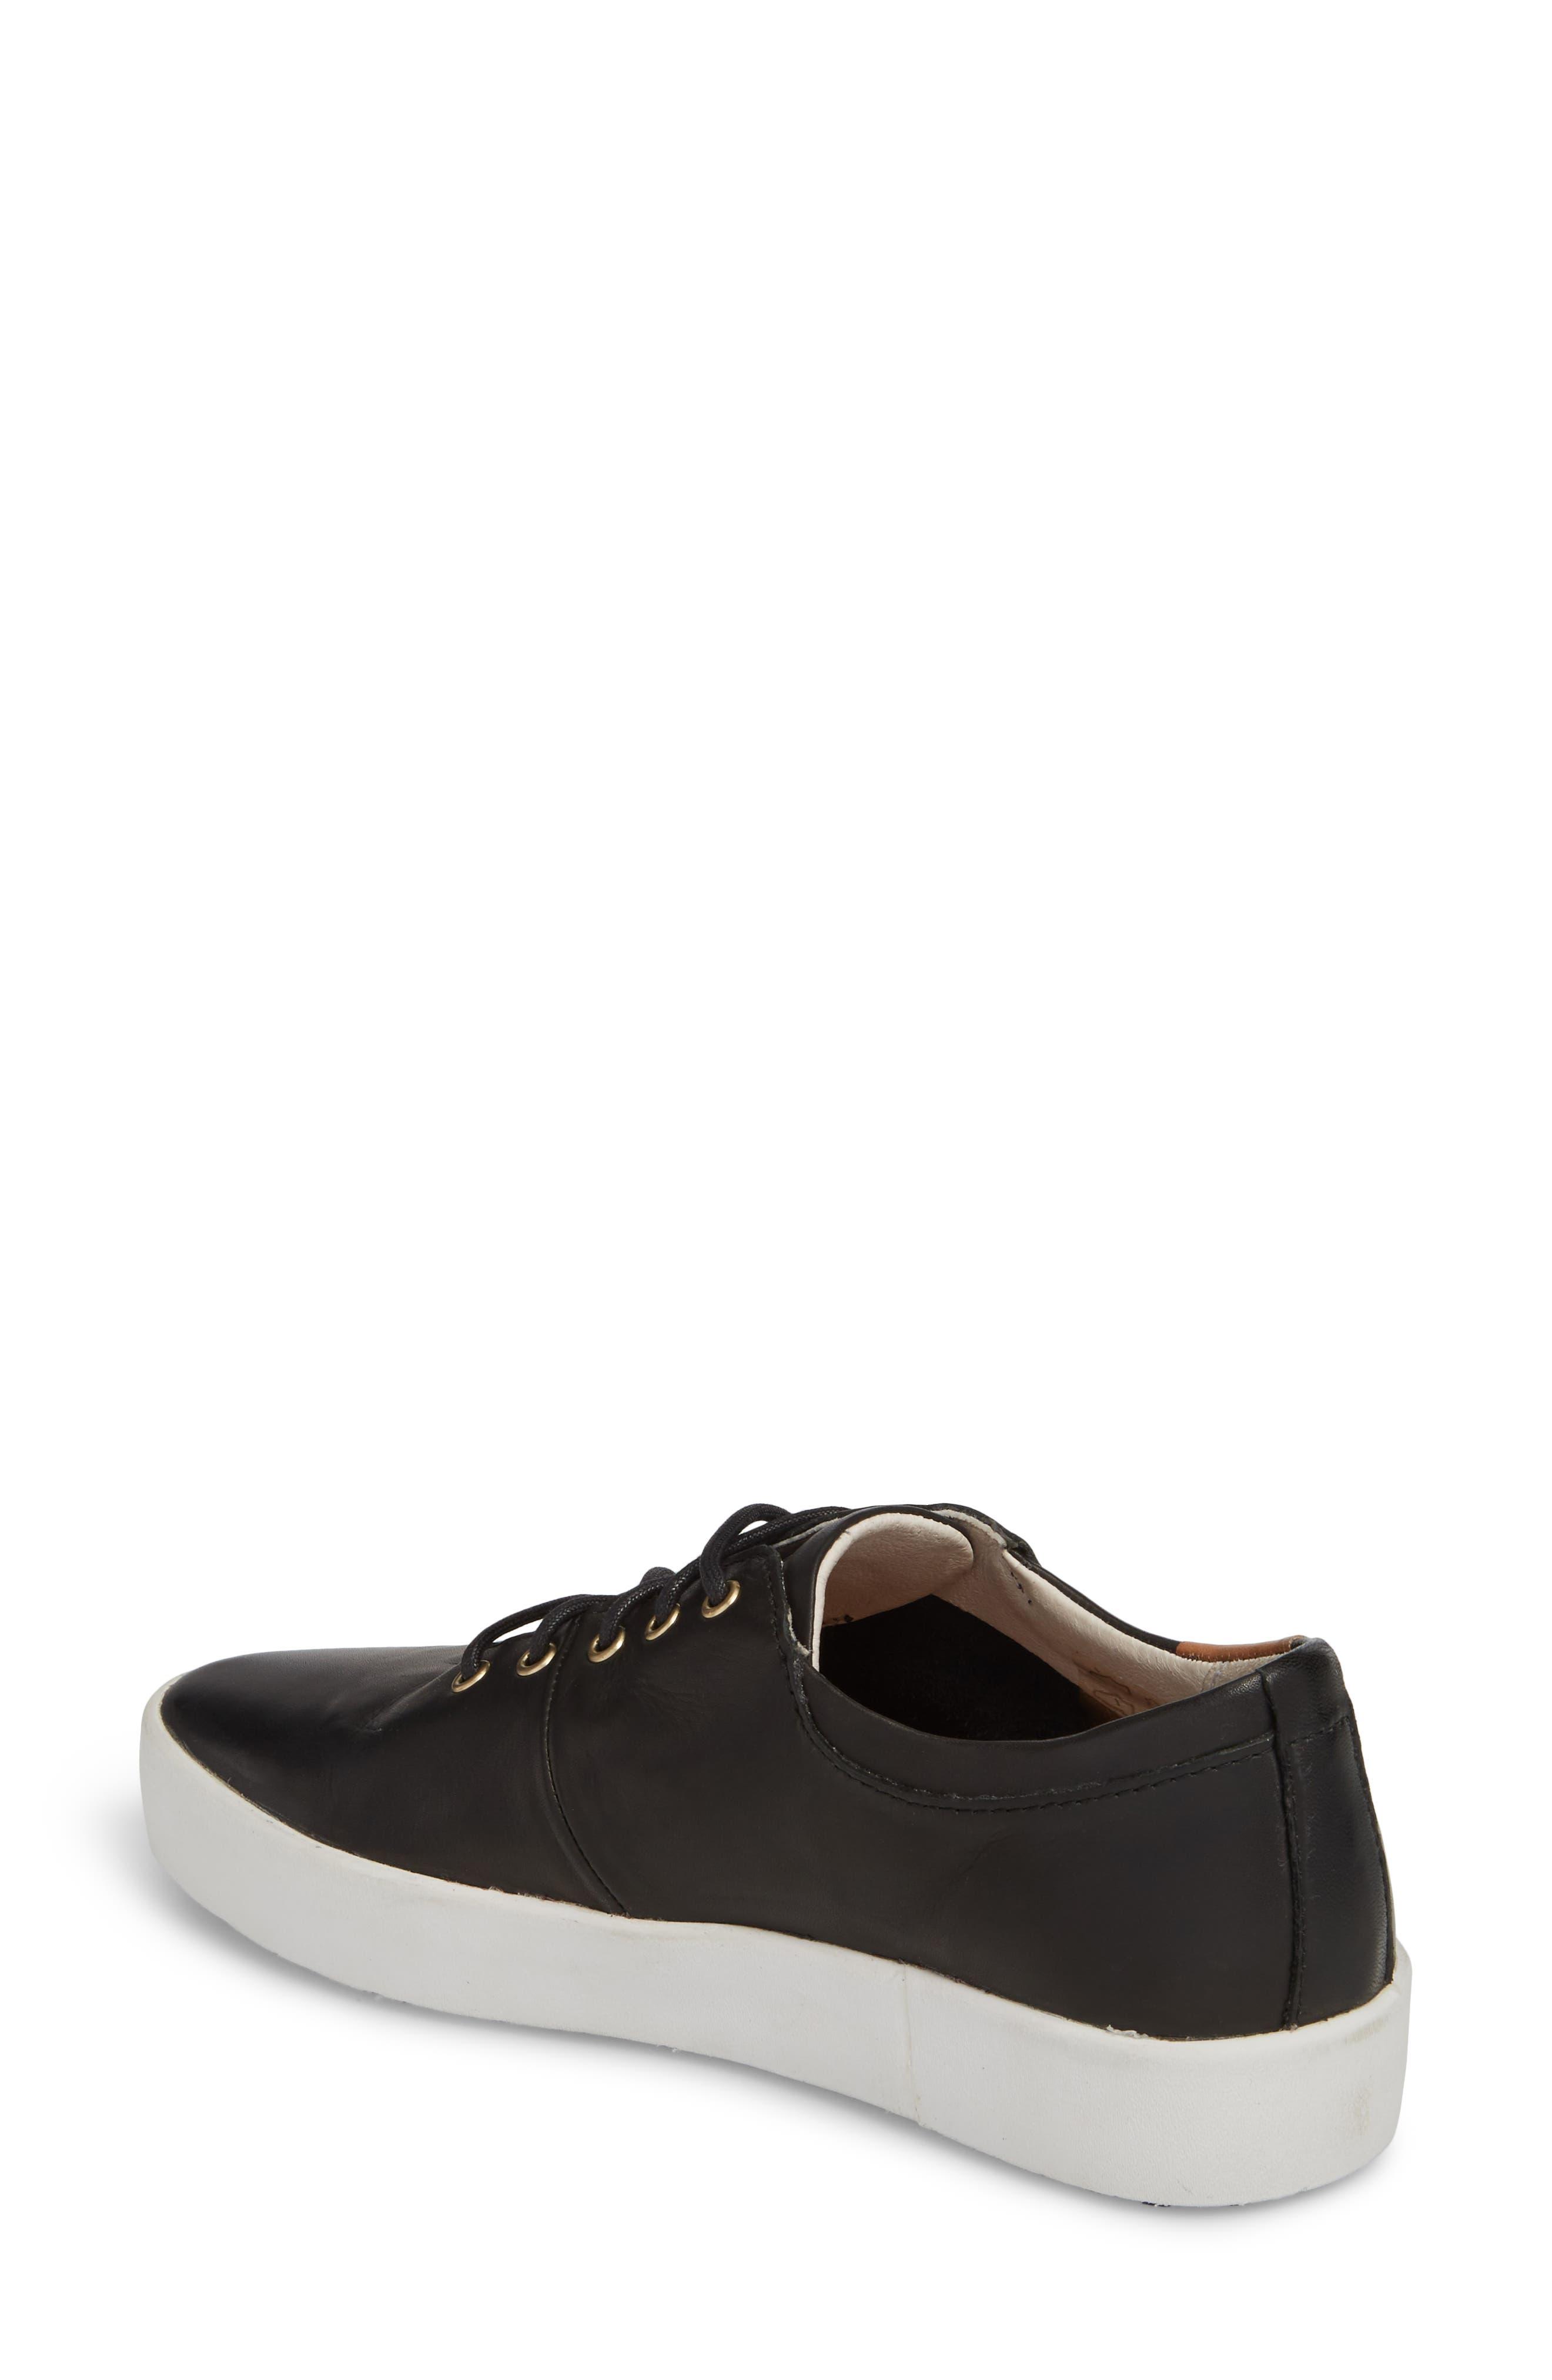 PL74 Sneaker,                             Alternate thumbnail 2, color,                             BLACK LEATHER